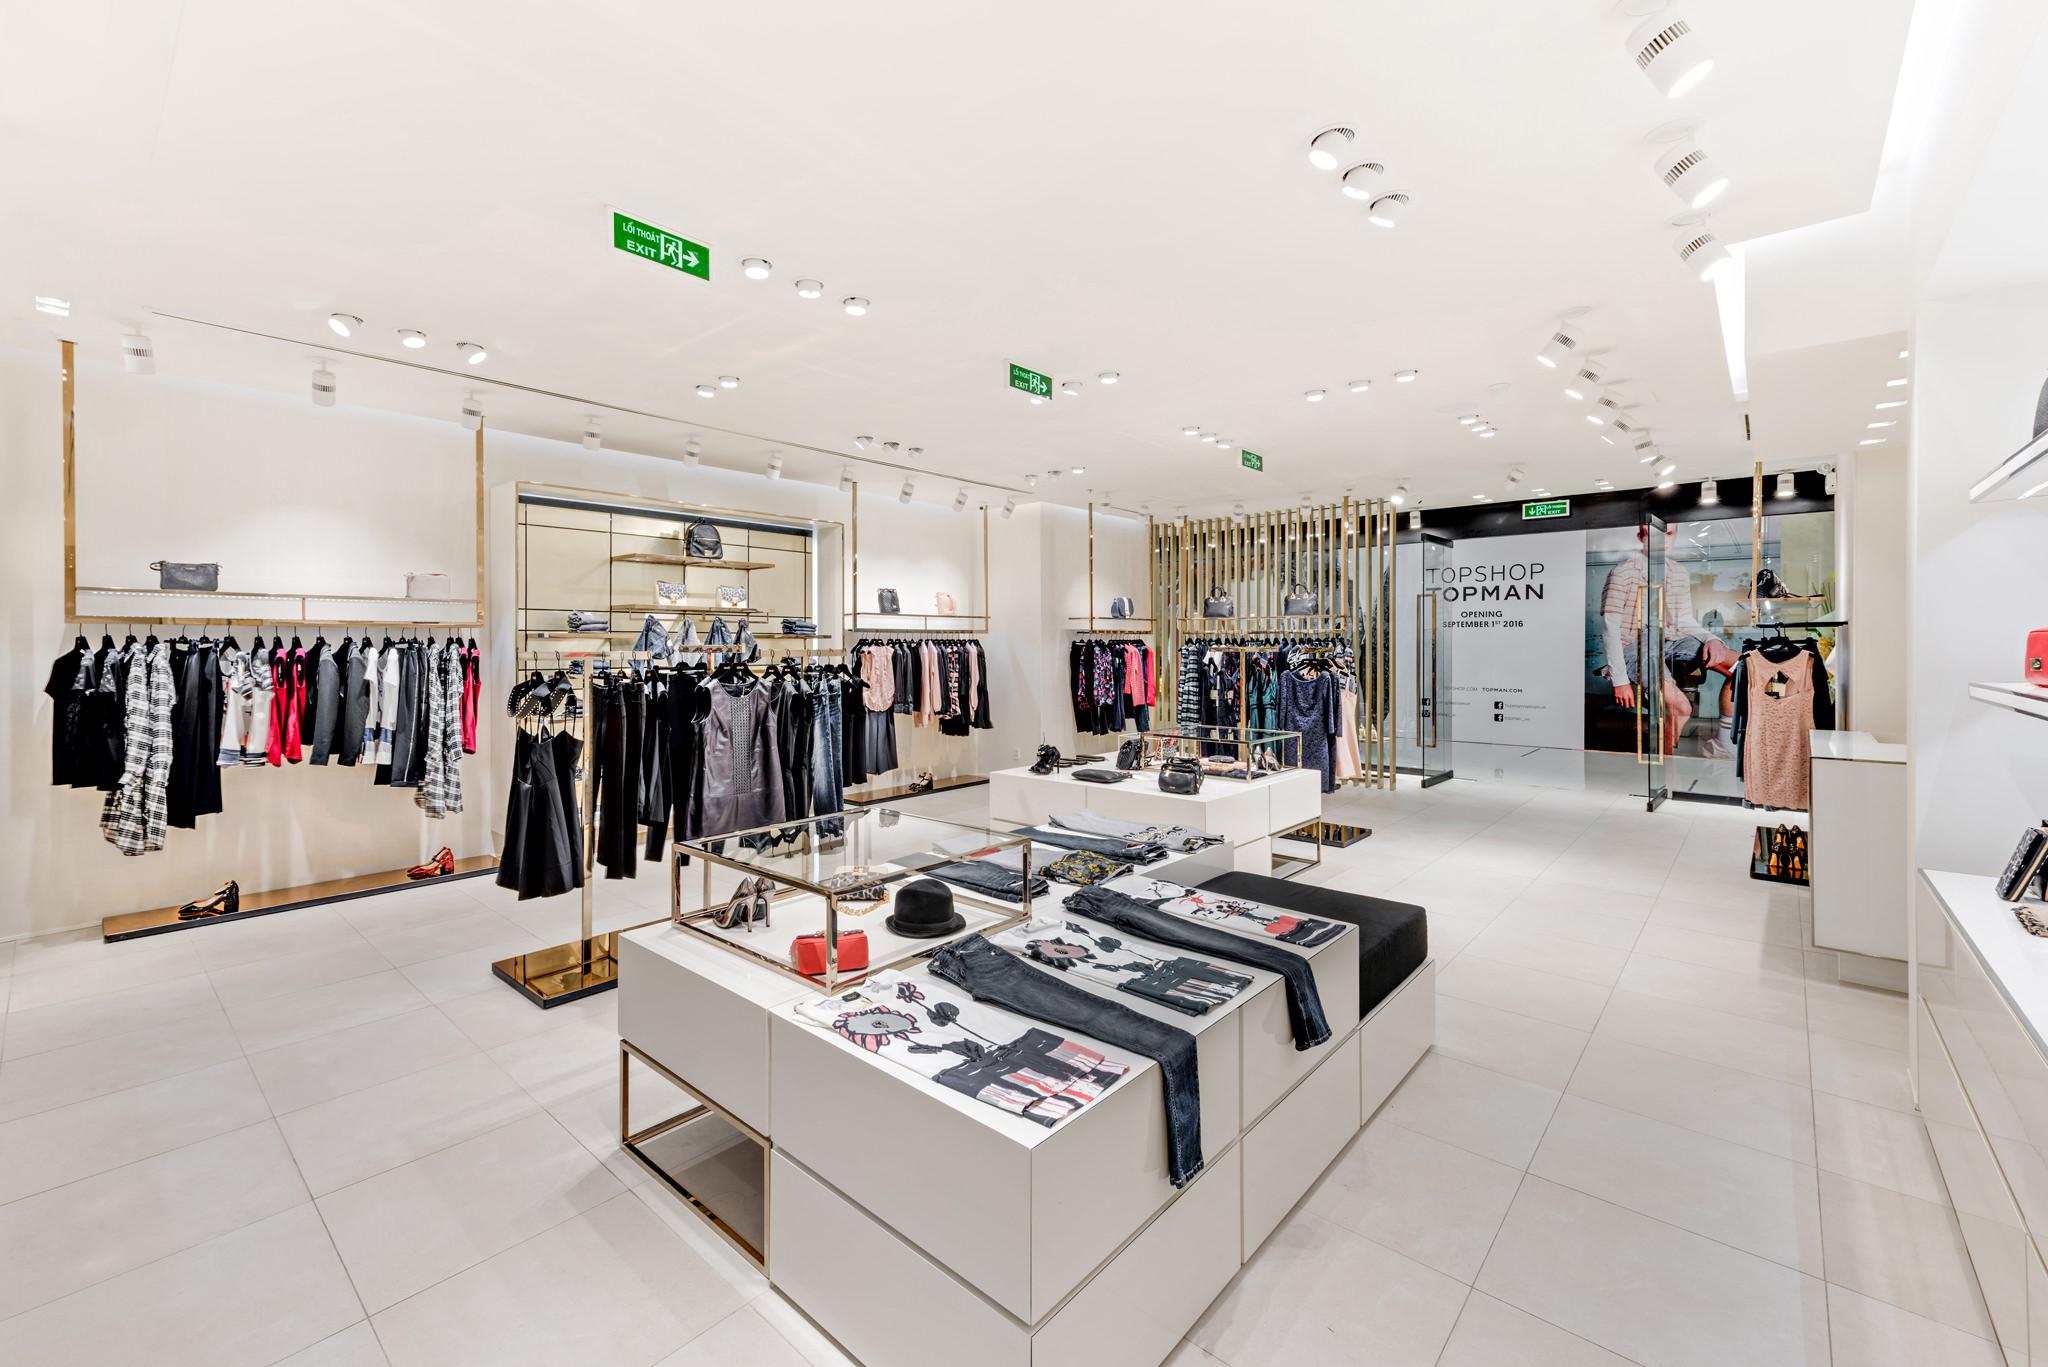 20160801 - Liu Jo - HCM - Commercial - Interior - Store - Retouch 0005.jpg